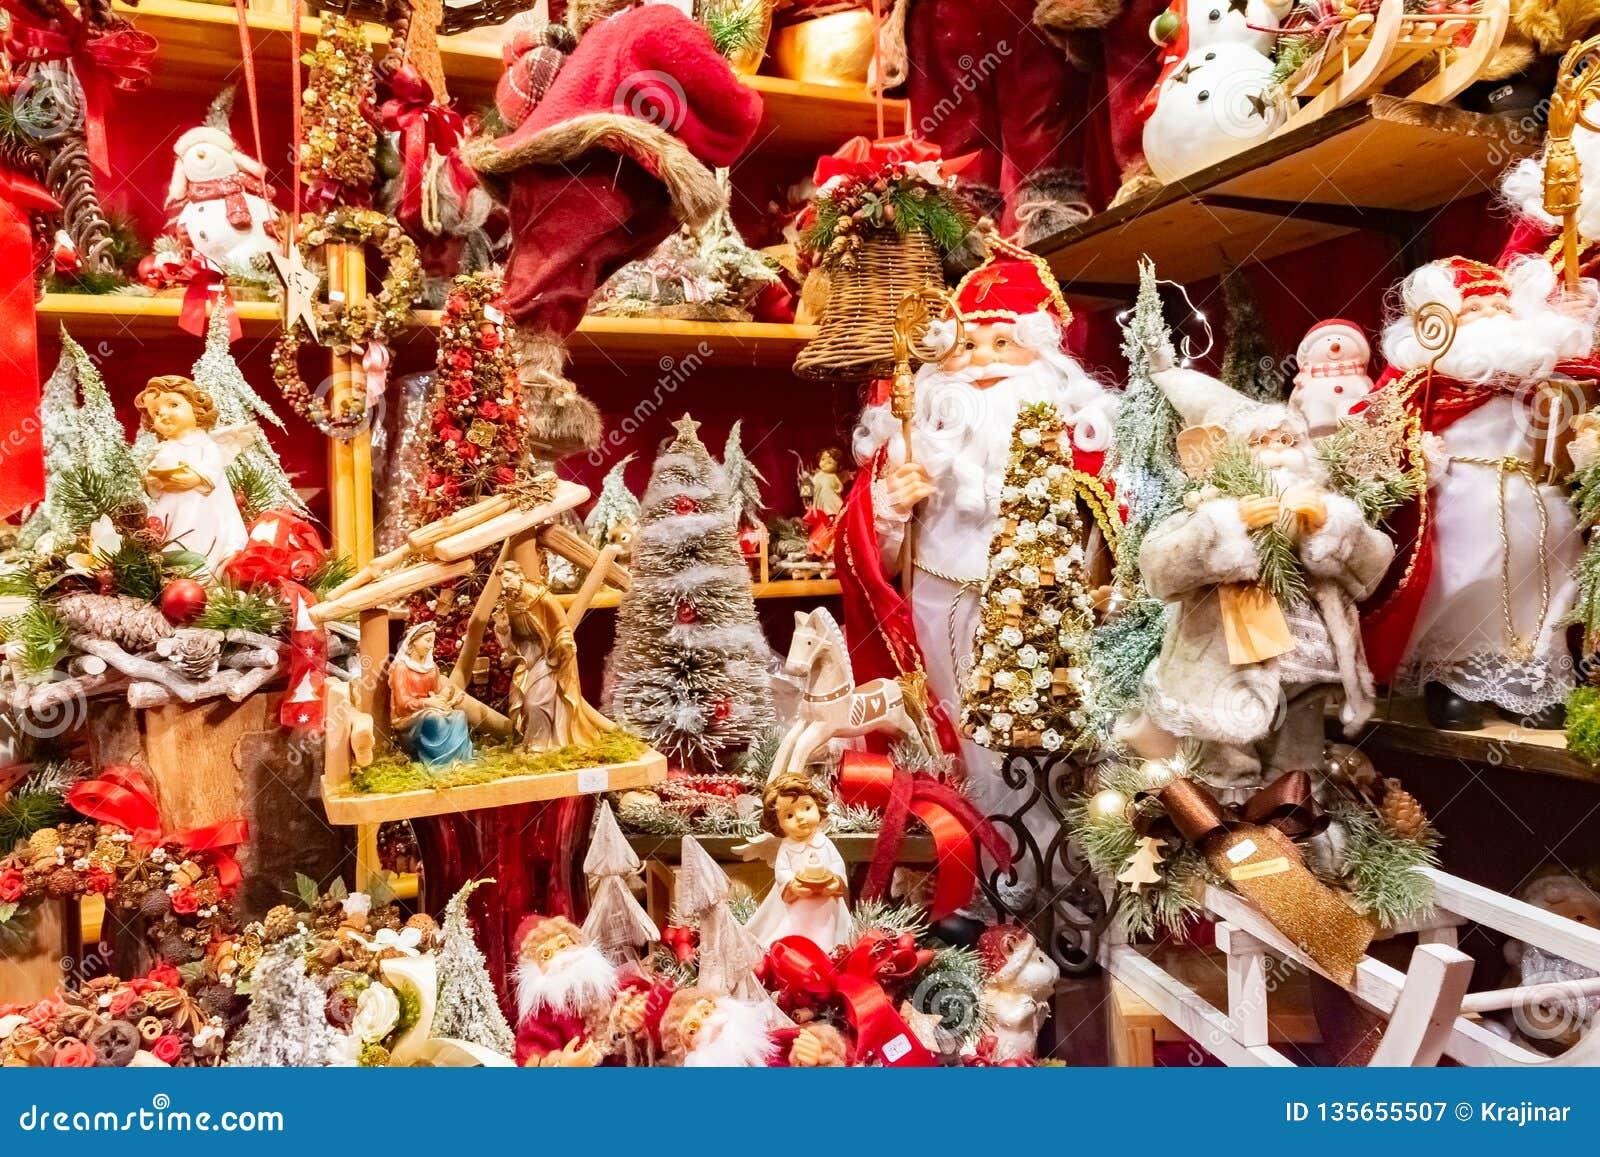 Santa Claus And Snowman Christmas Decorations At The